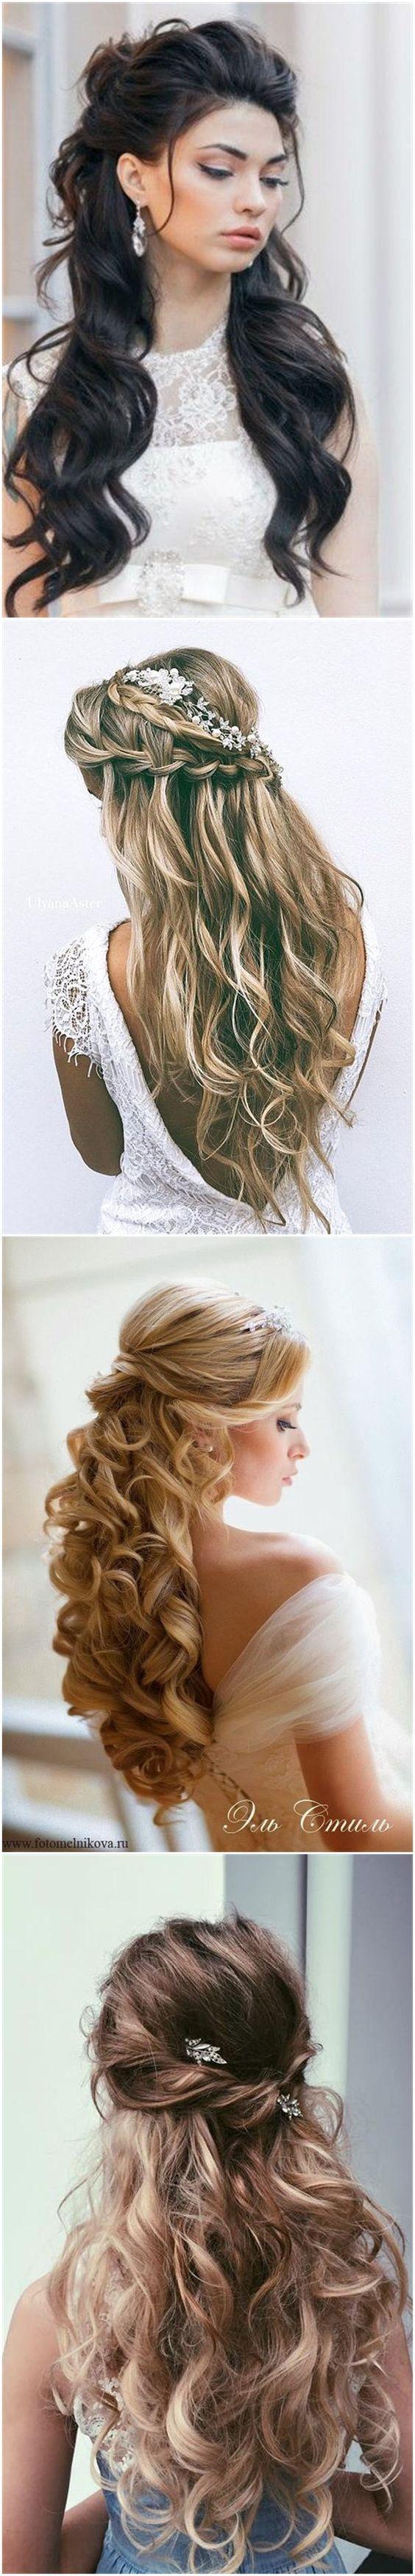 17 best Wedding Hair images on Pinterest